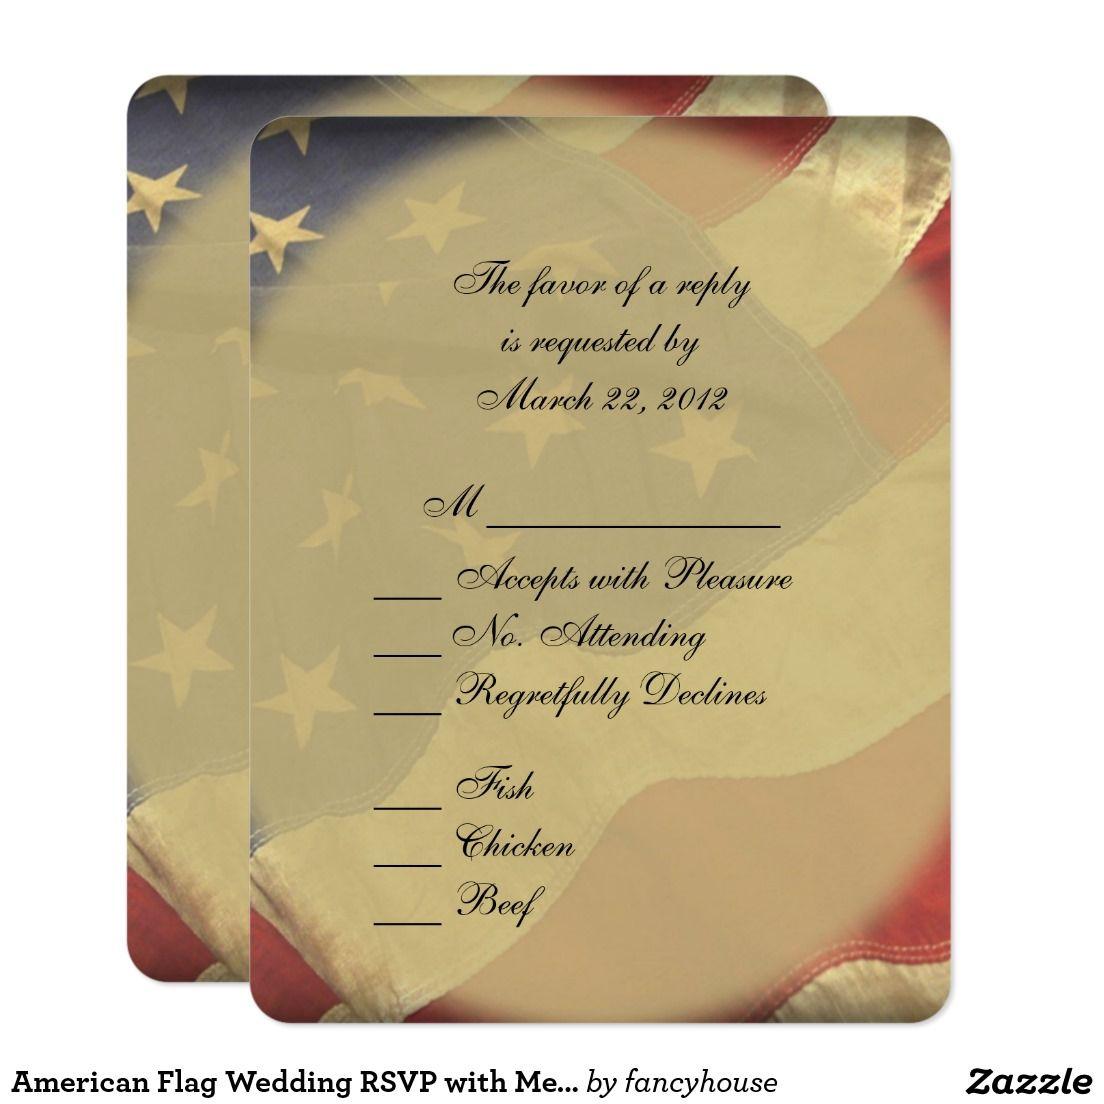 American Flag Wedding RSVP With Menu Choices